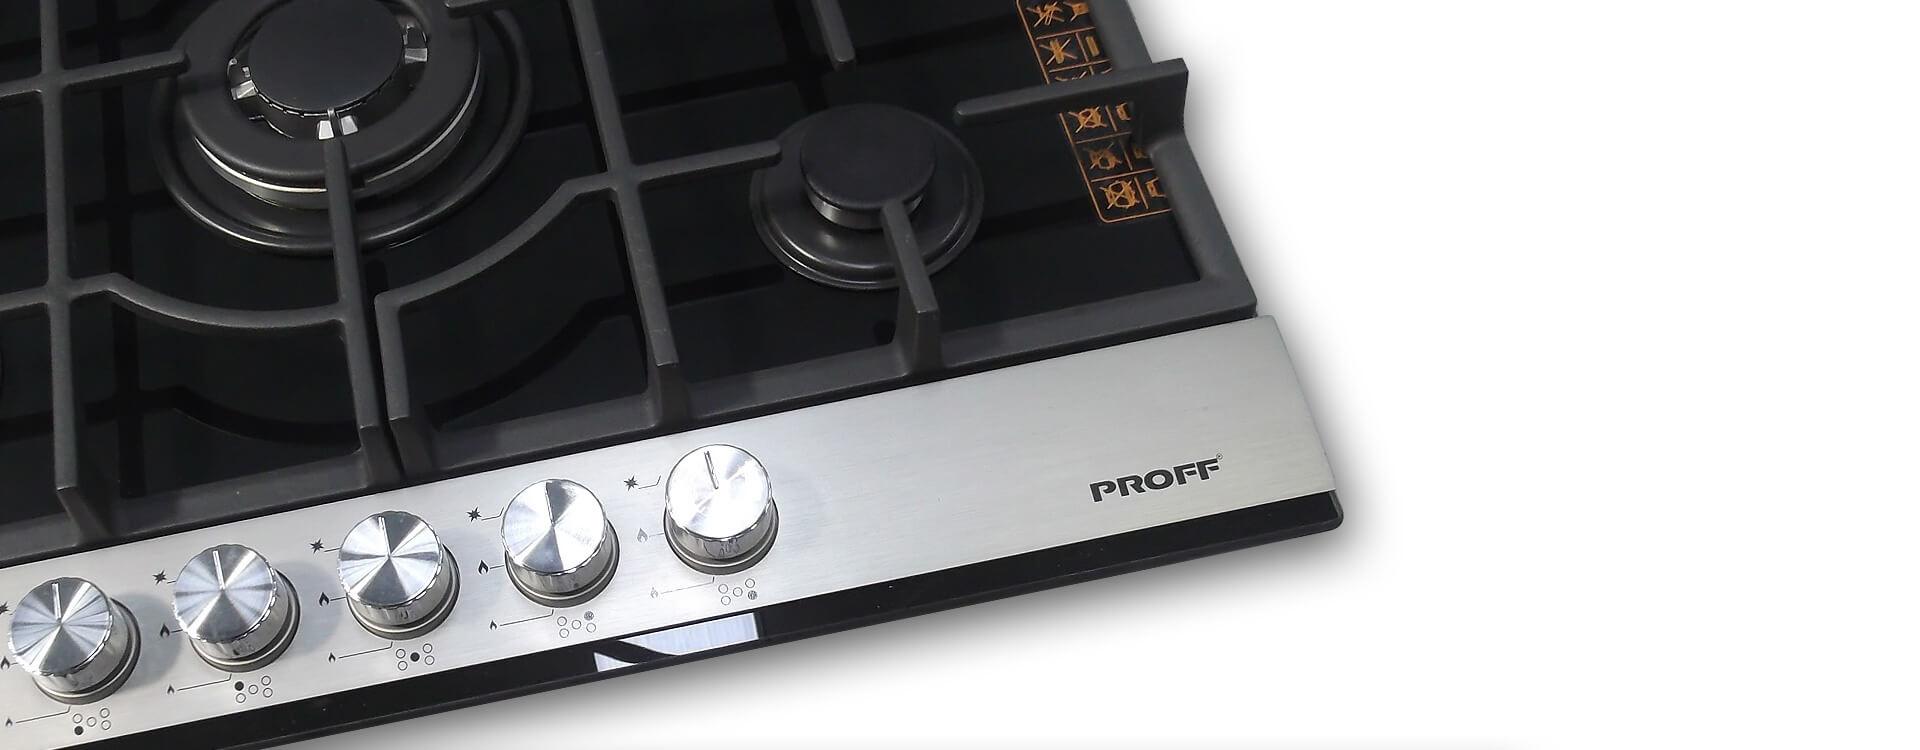 proff-slide-55